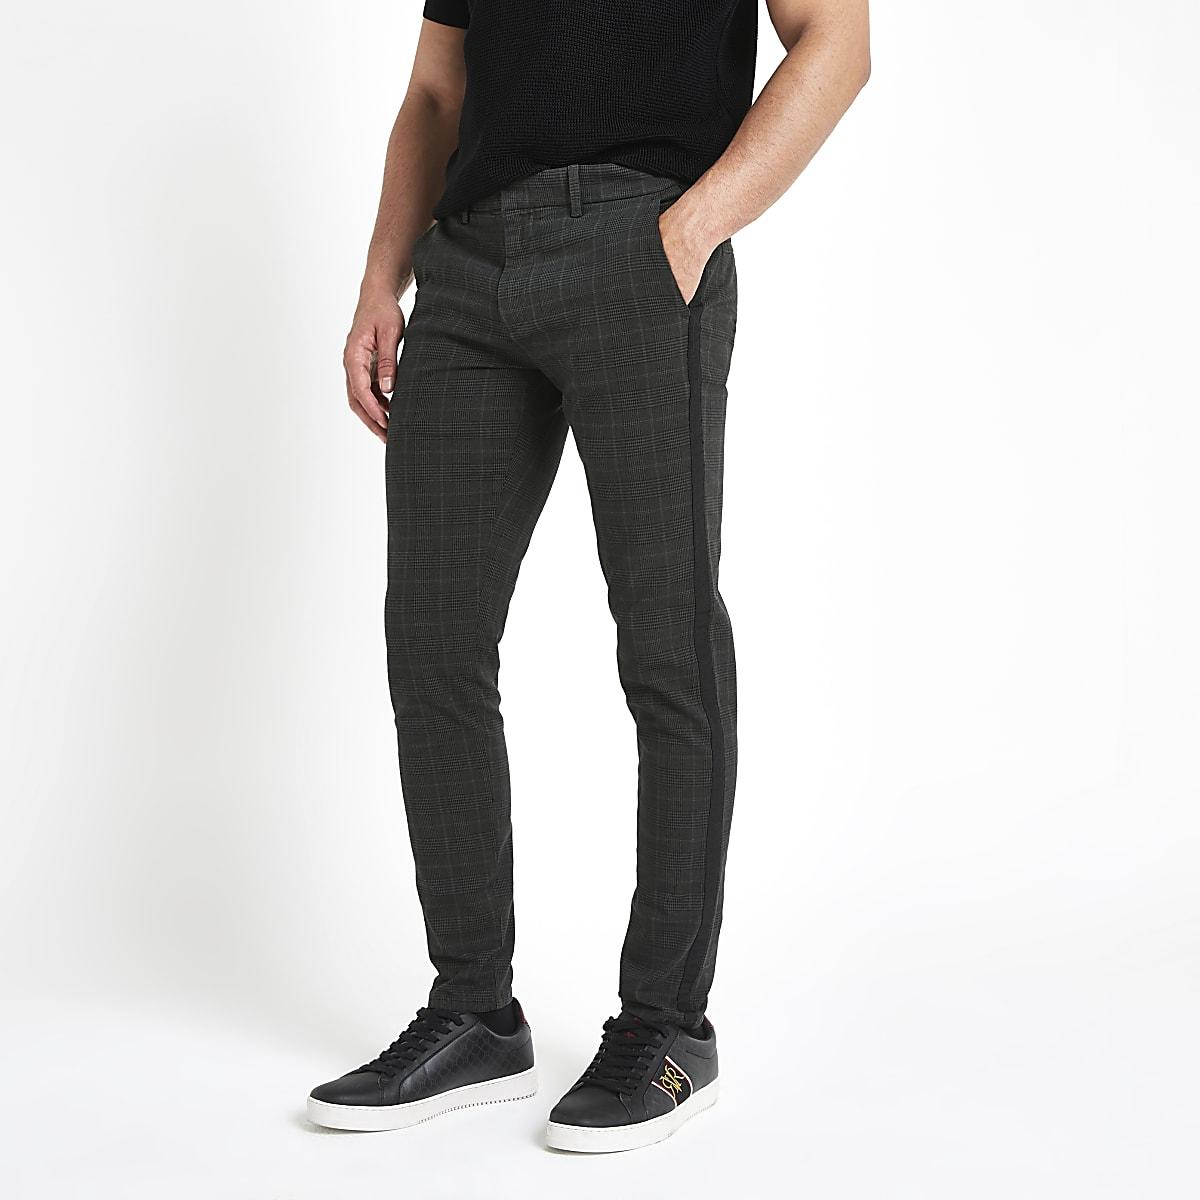 Khaki check skinny fit pants